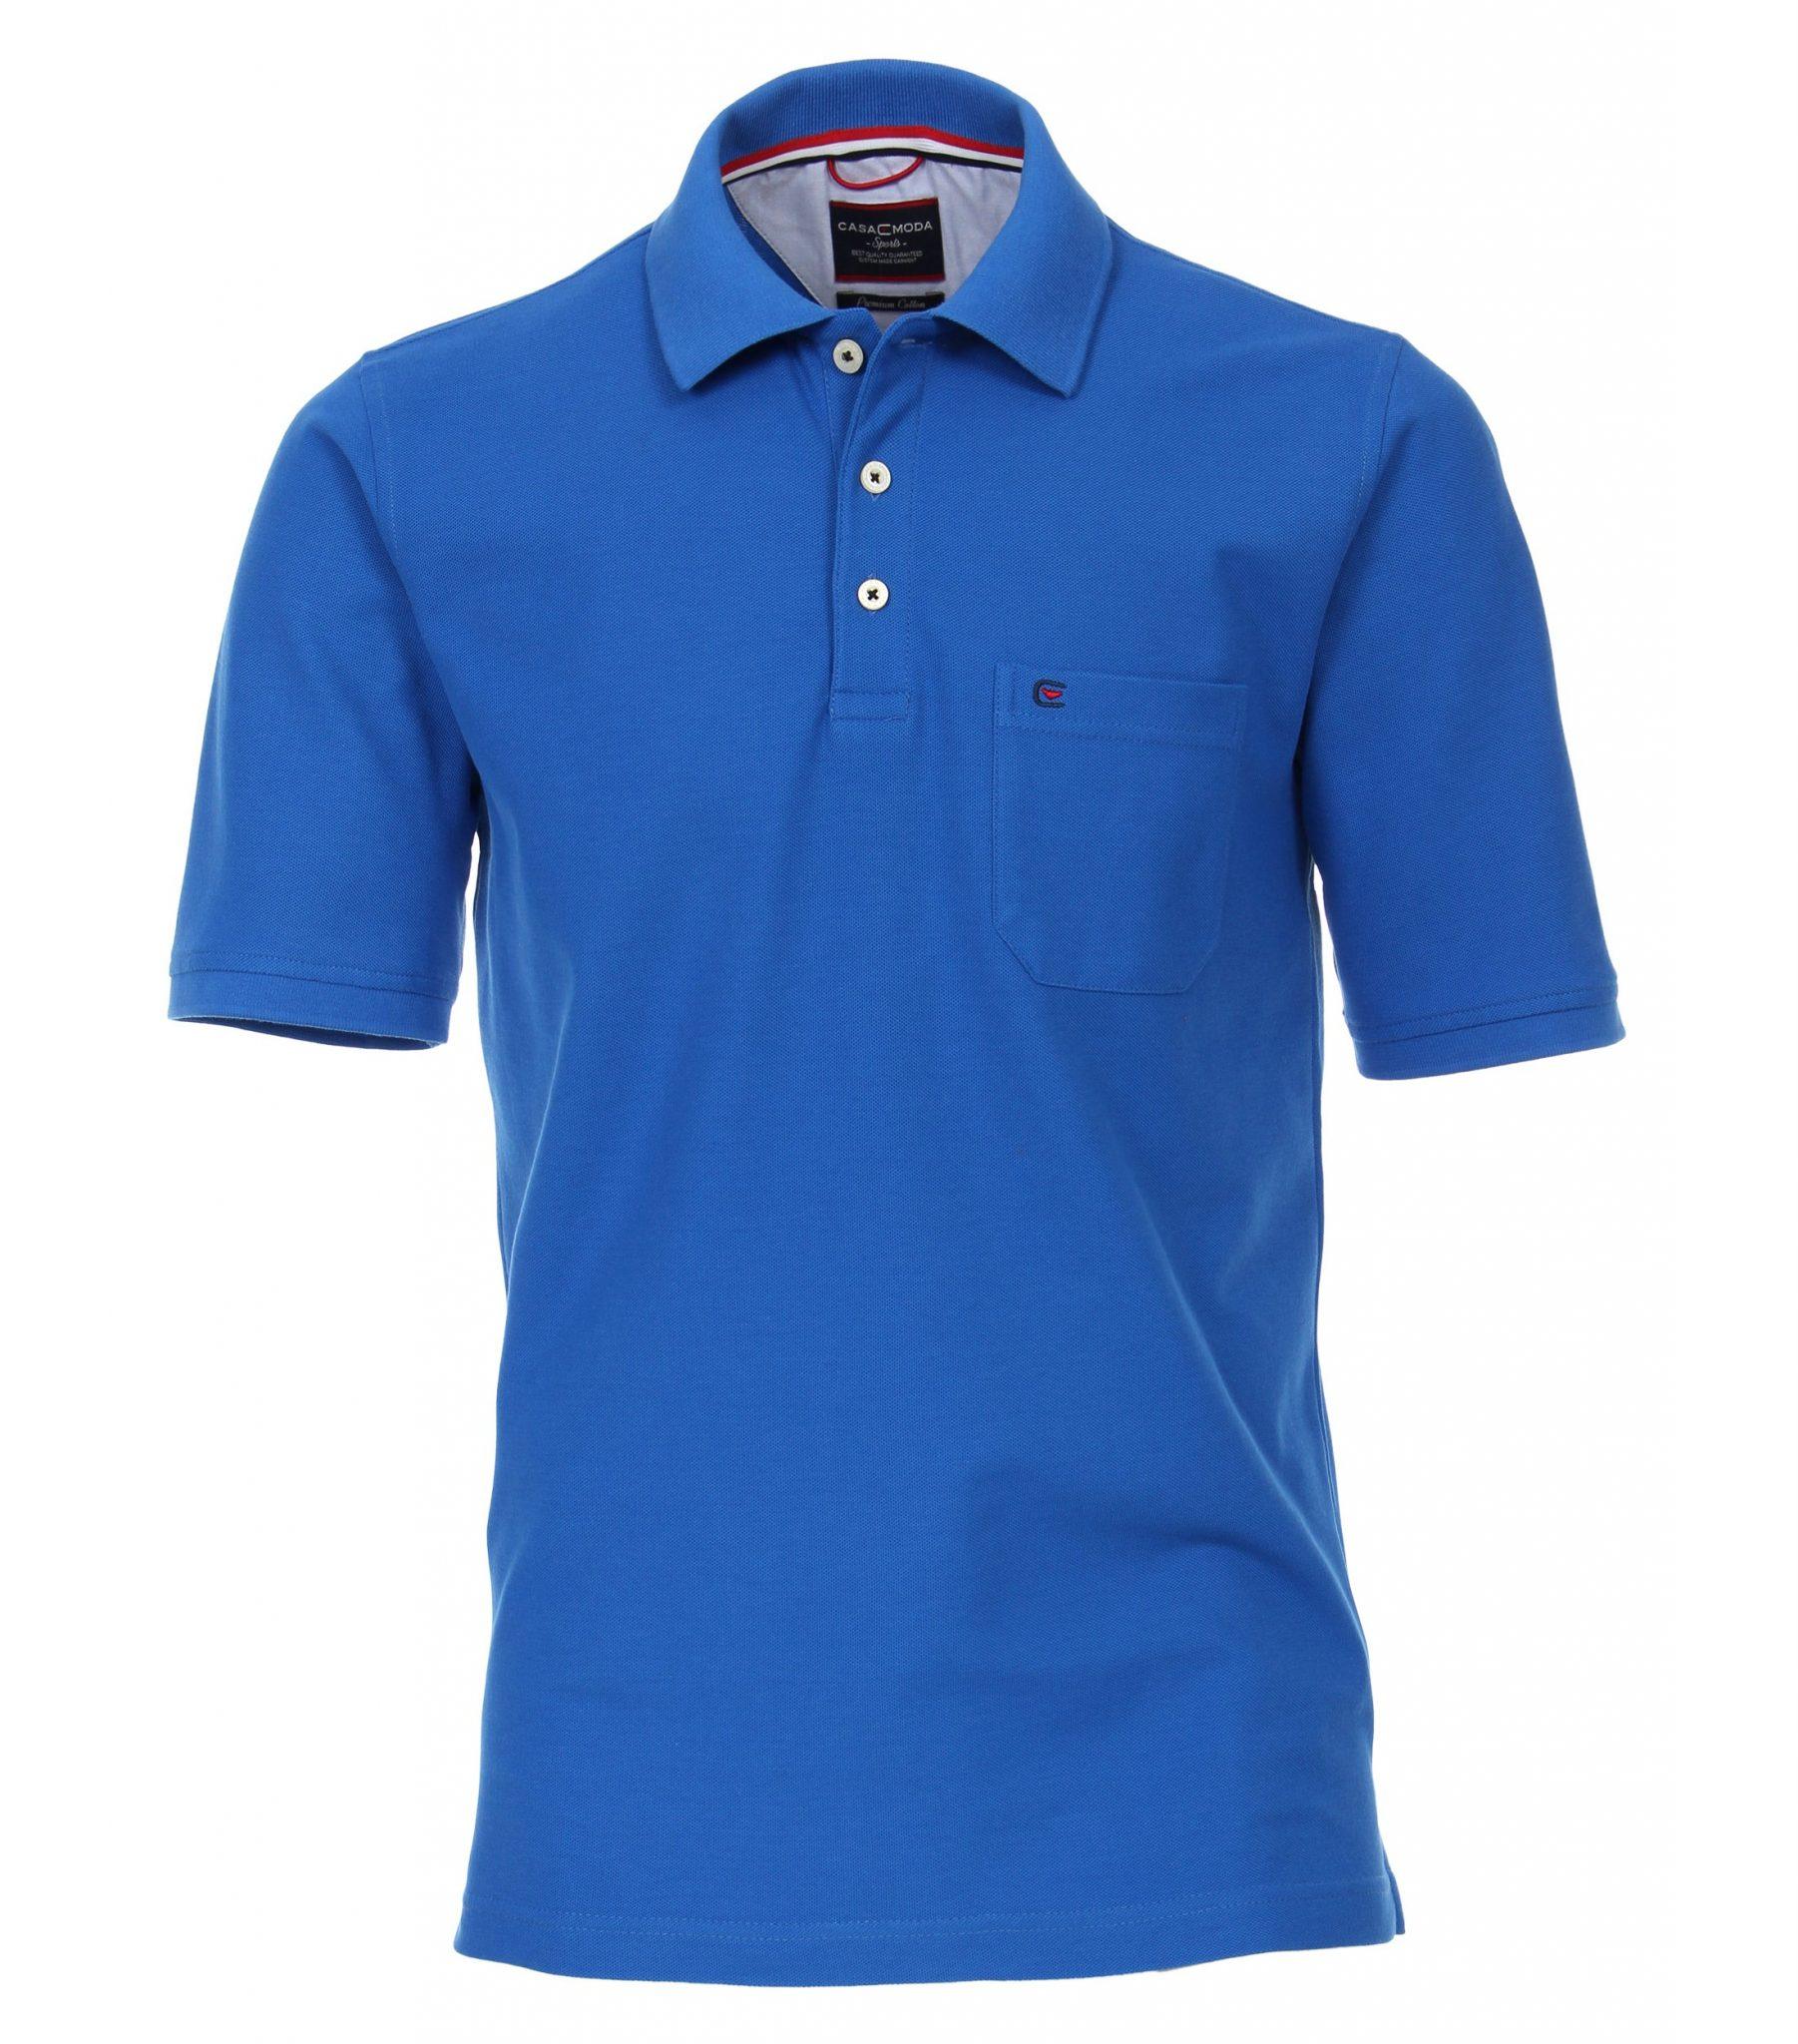 Casa Moda grote maat poloshirt uni blauw met borstzakje